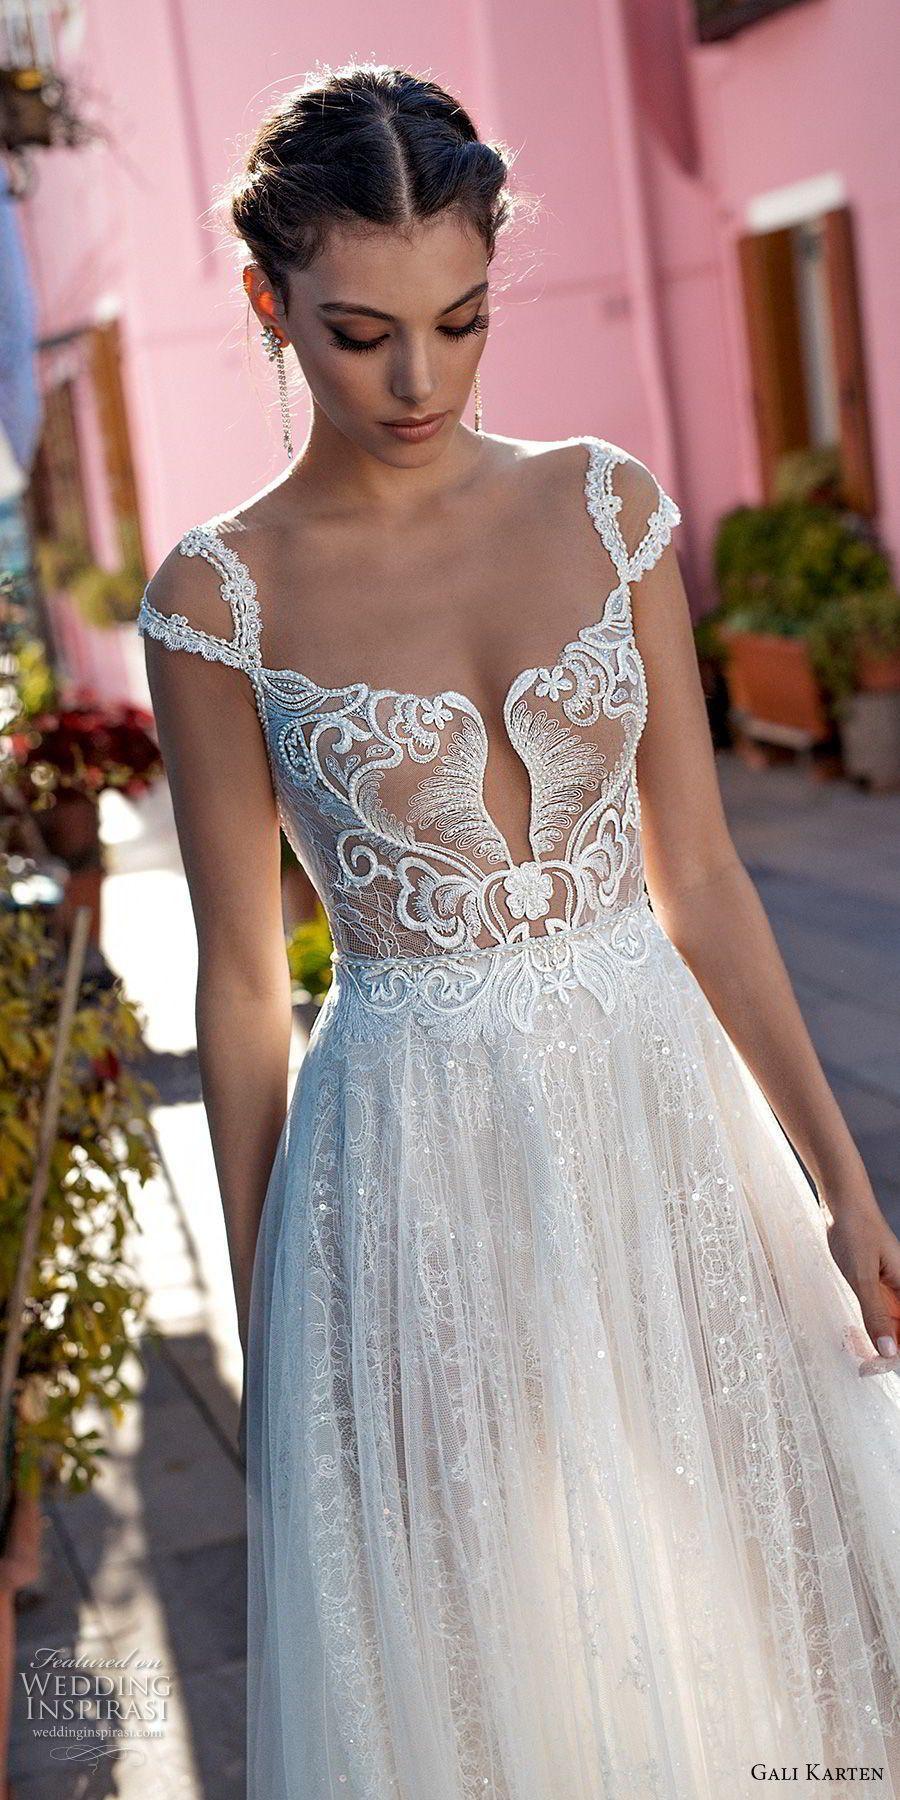 Gali karten bridal cap sleeves scoop neckline heavily